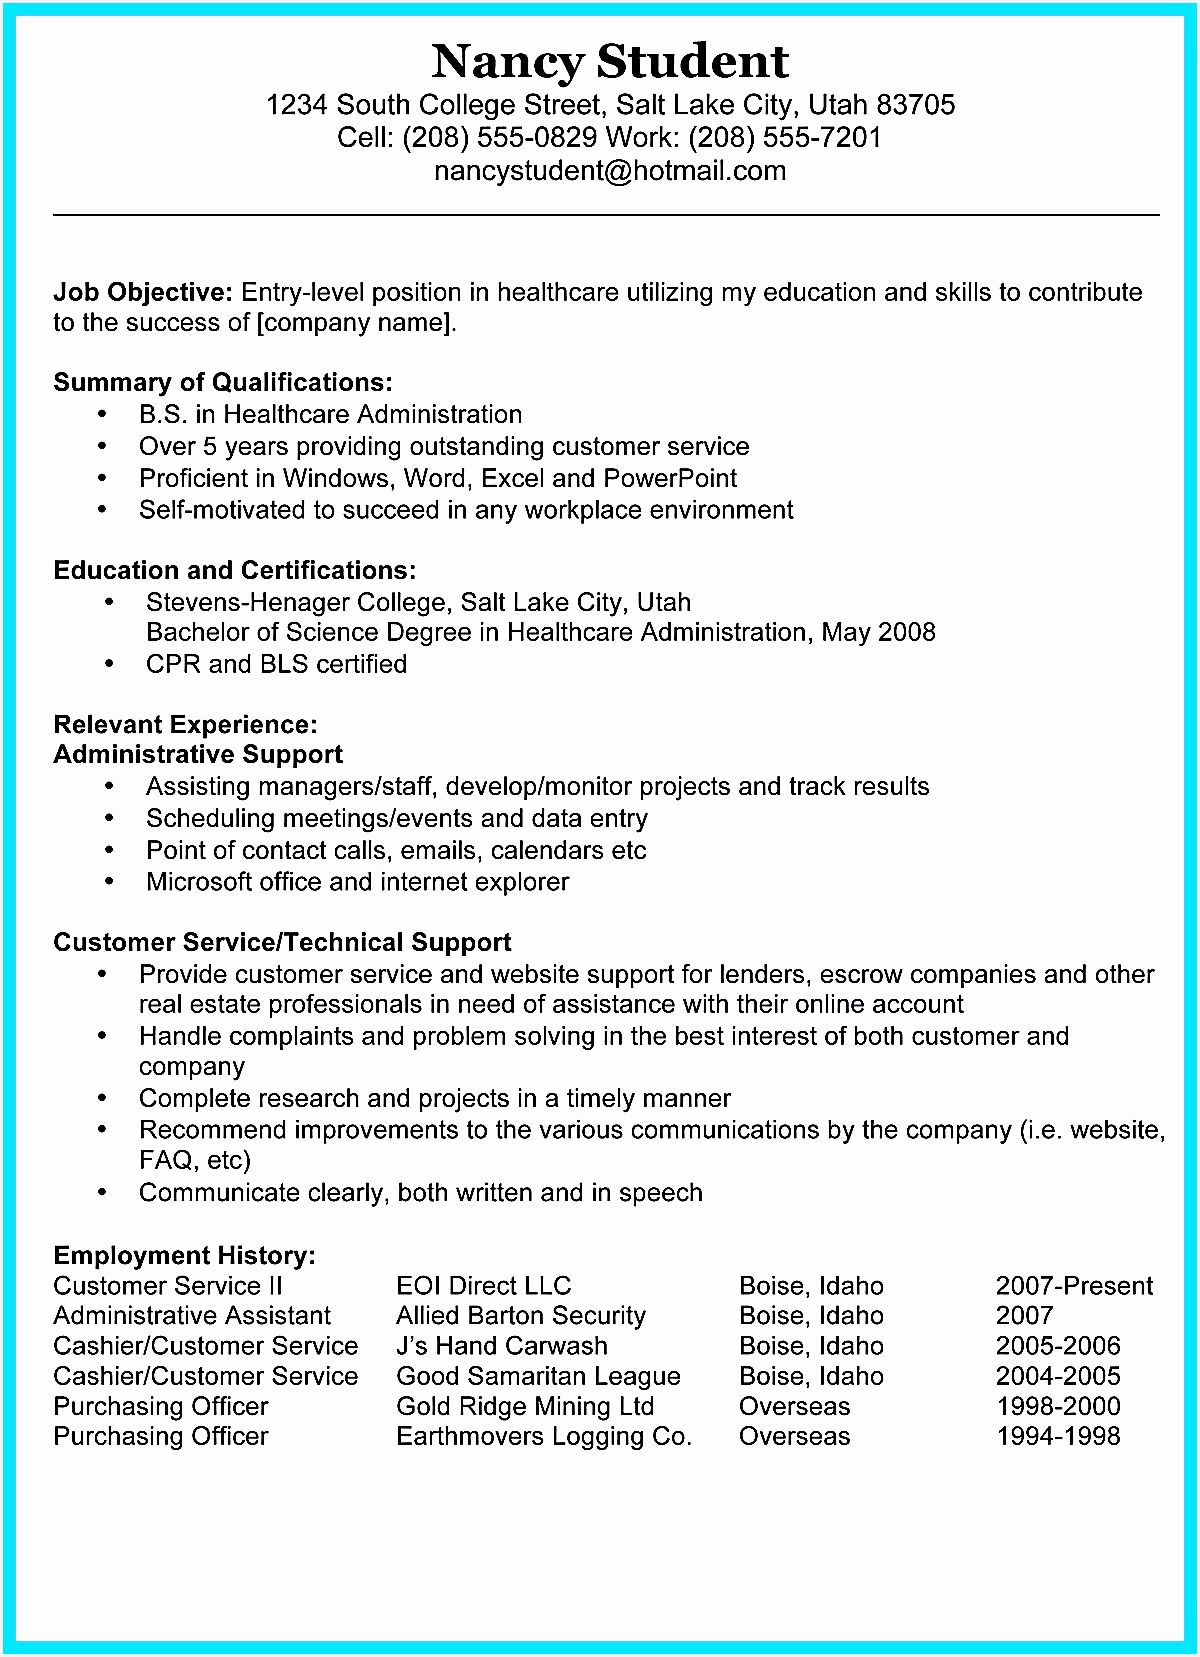 Microsoft Resume Templates Word Inspirational Sales Resume Template Word Luxury Free Microsoft Resume Templates16571200